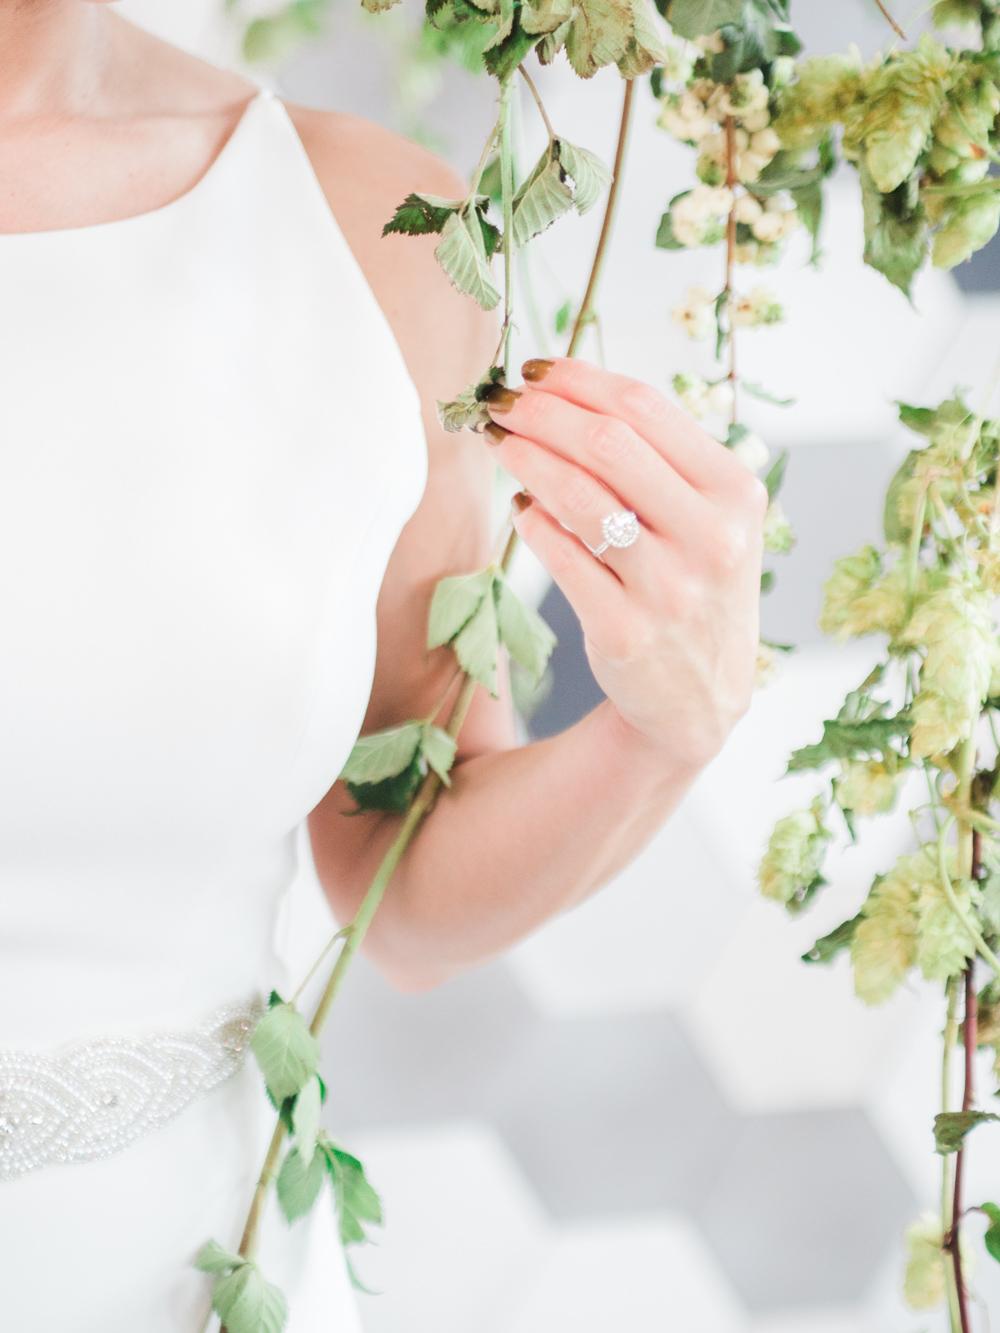 teal_modern-romantic-orange-industiral-wedding-inspiration40